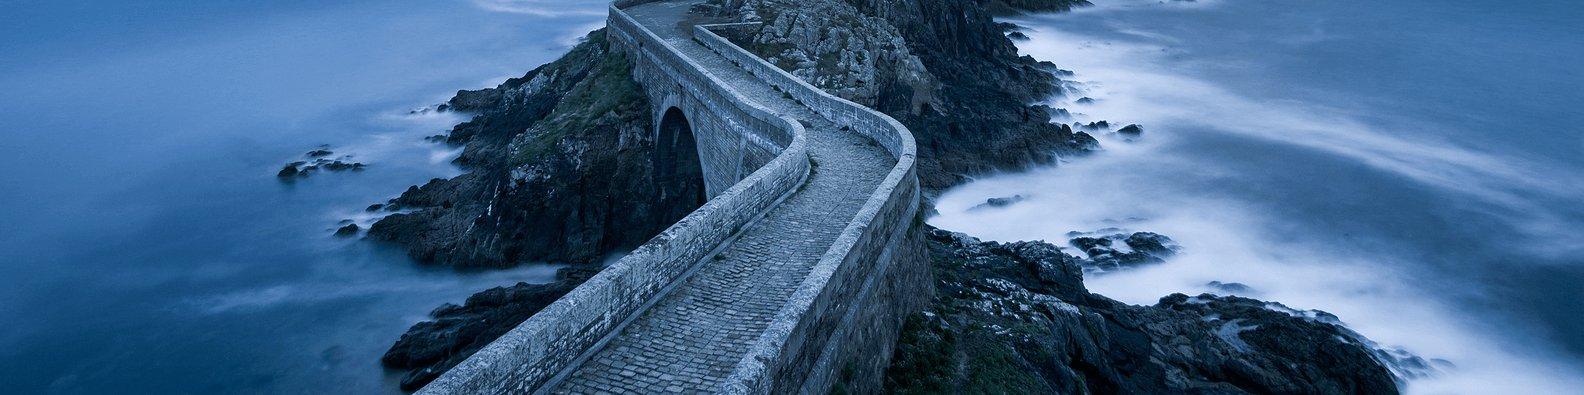 Bridge-to-Fantasy.png